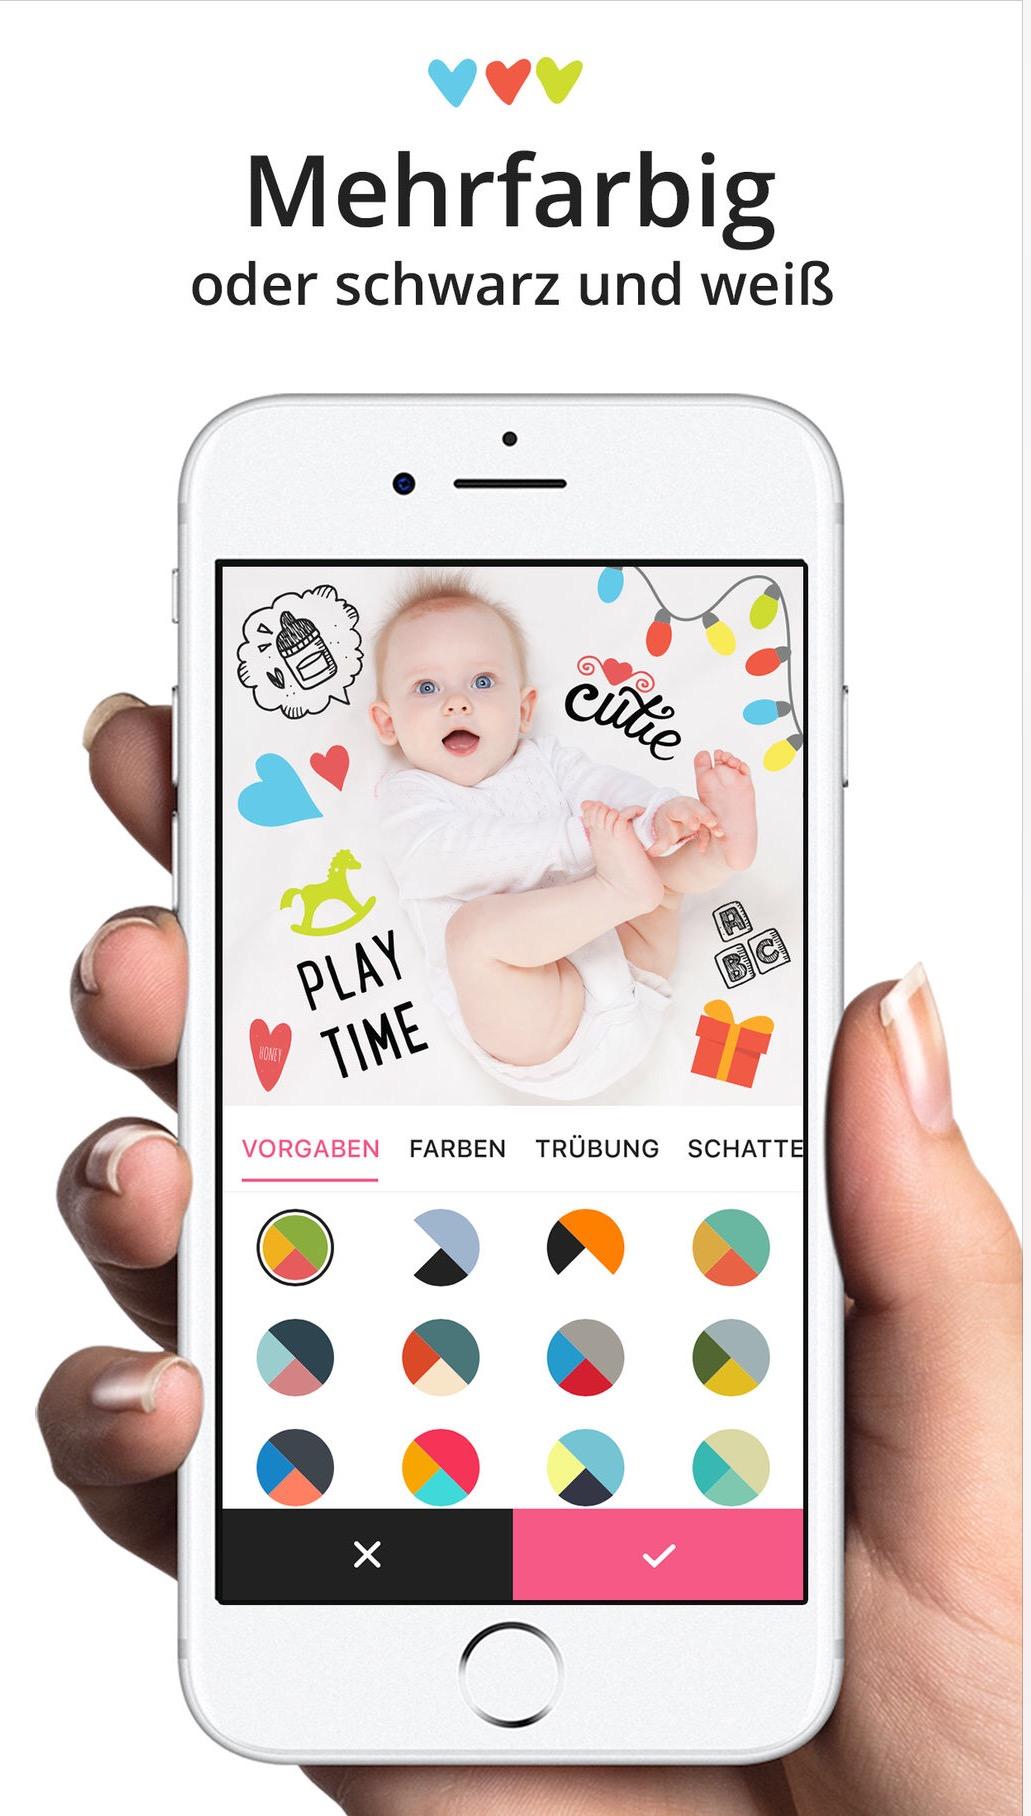 1040303 - [iOS] Lil Pics: Bildbearbeitung GRATIS statt 5,49€